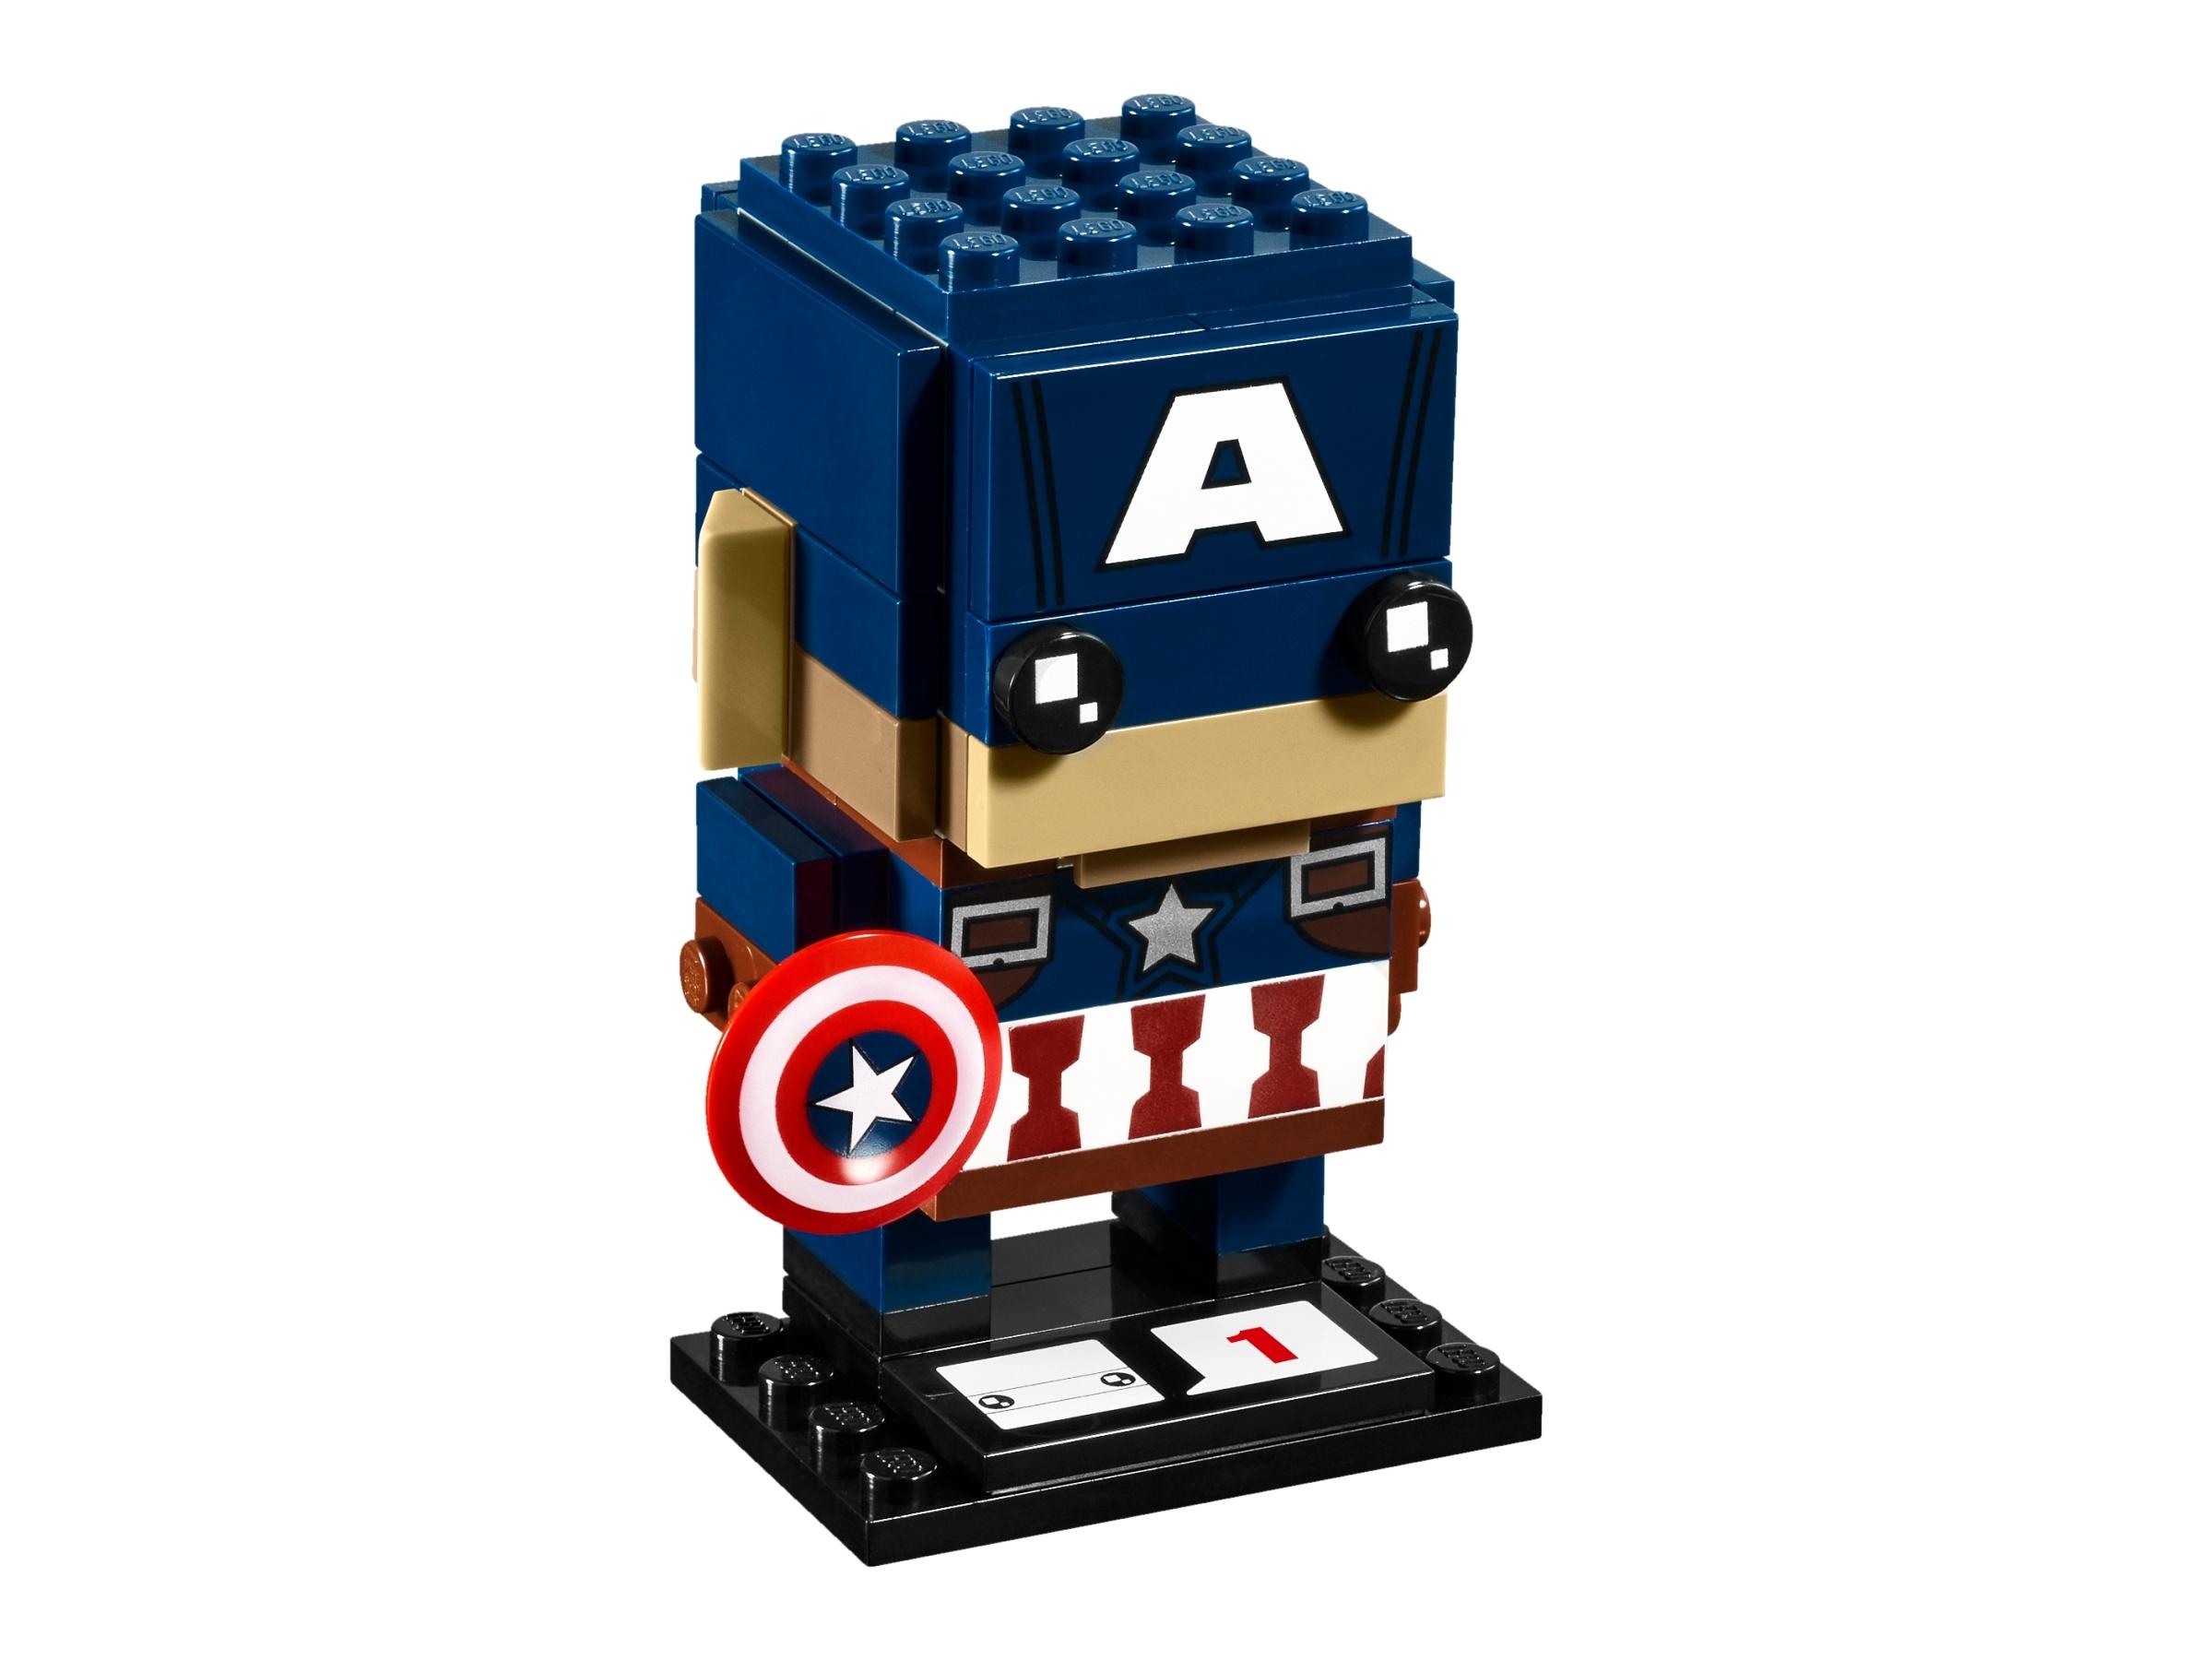 Captain America 41589 Brickheadz Buy Online At The Official Lego Shop Us